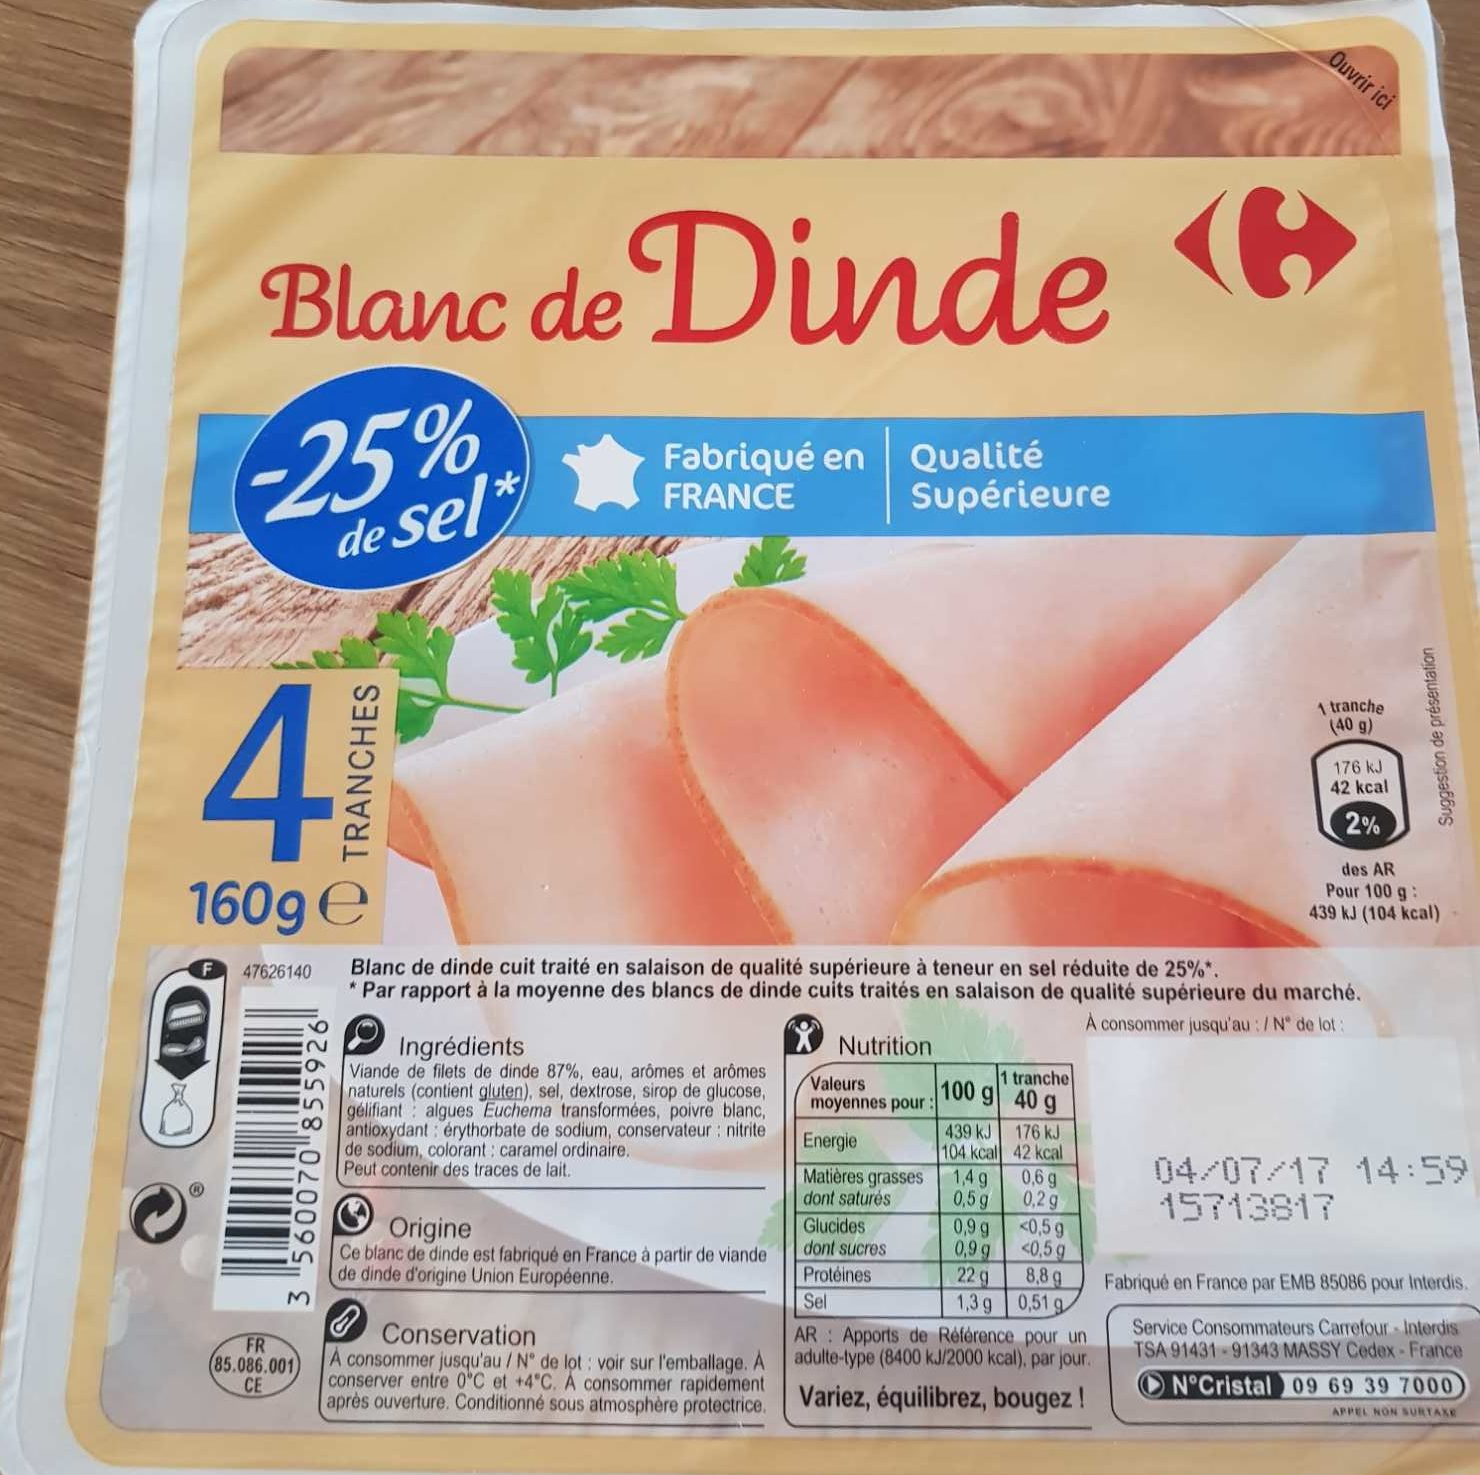 Blanc de Dinde - Product